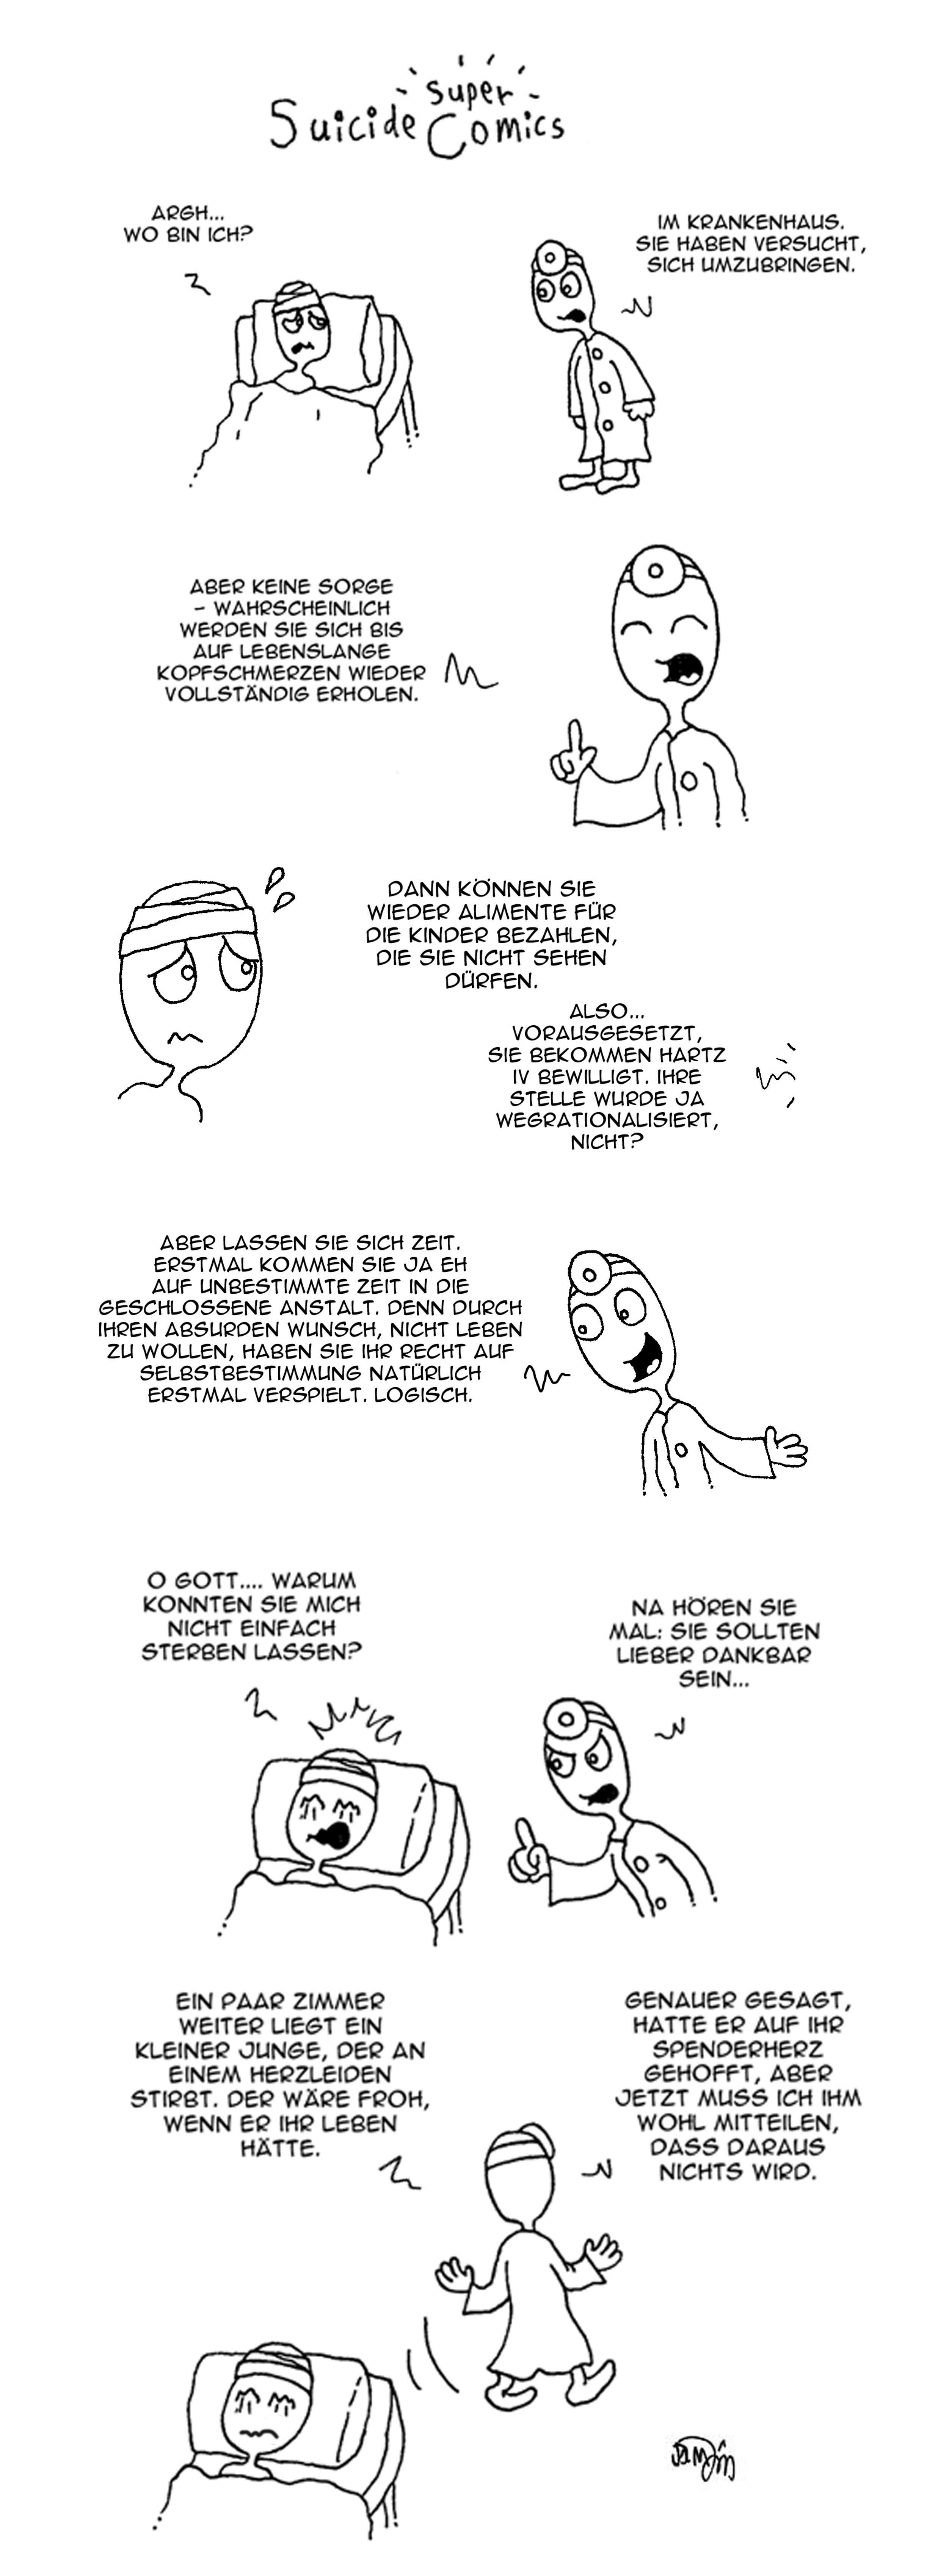 Suicide Super Comics08